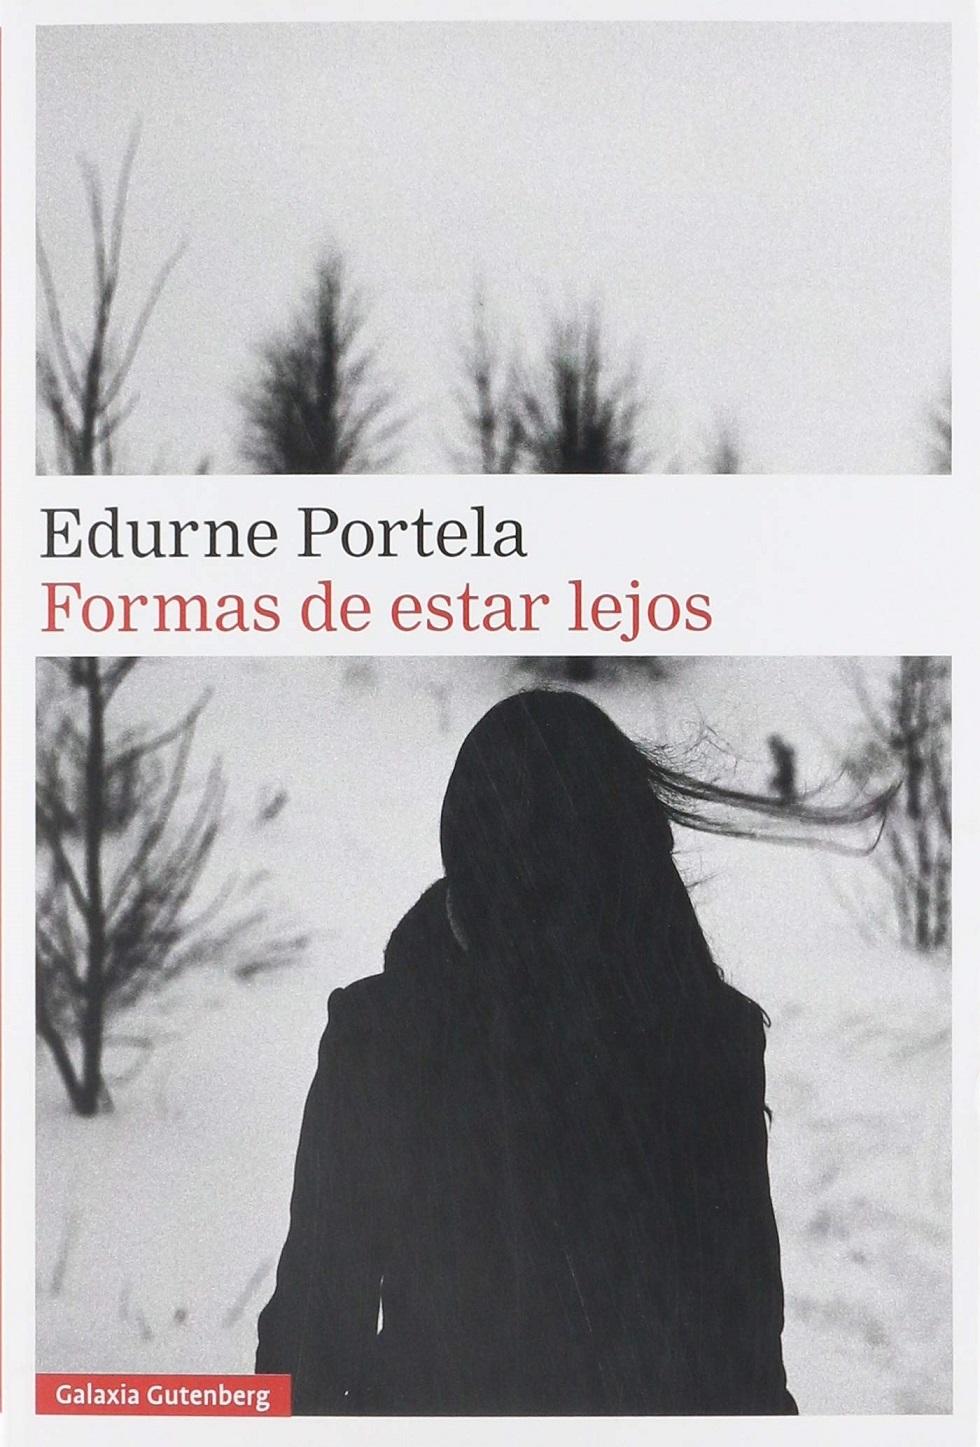 https://laantiguabiblos.blogspot.com/2019/09/formas-de-estar-lejos-edurne-portela.html